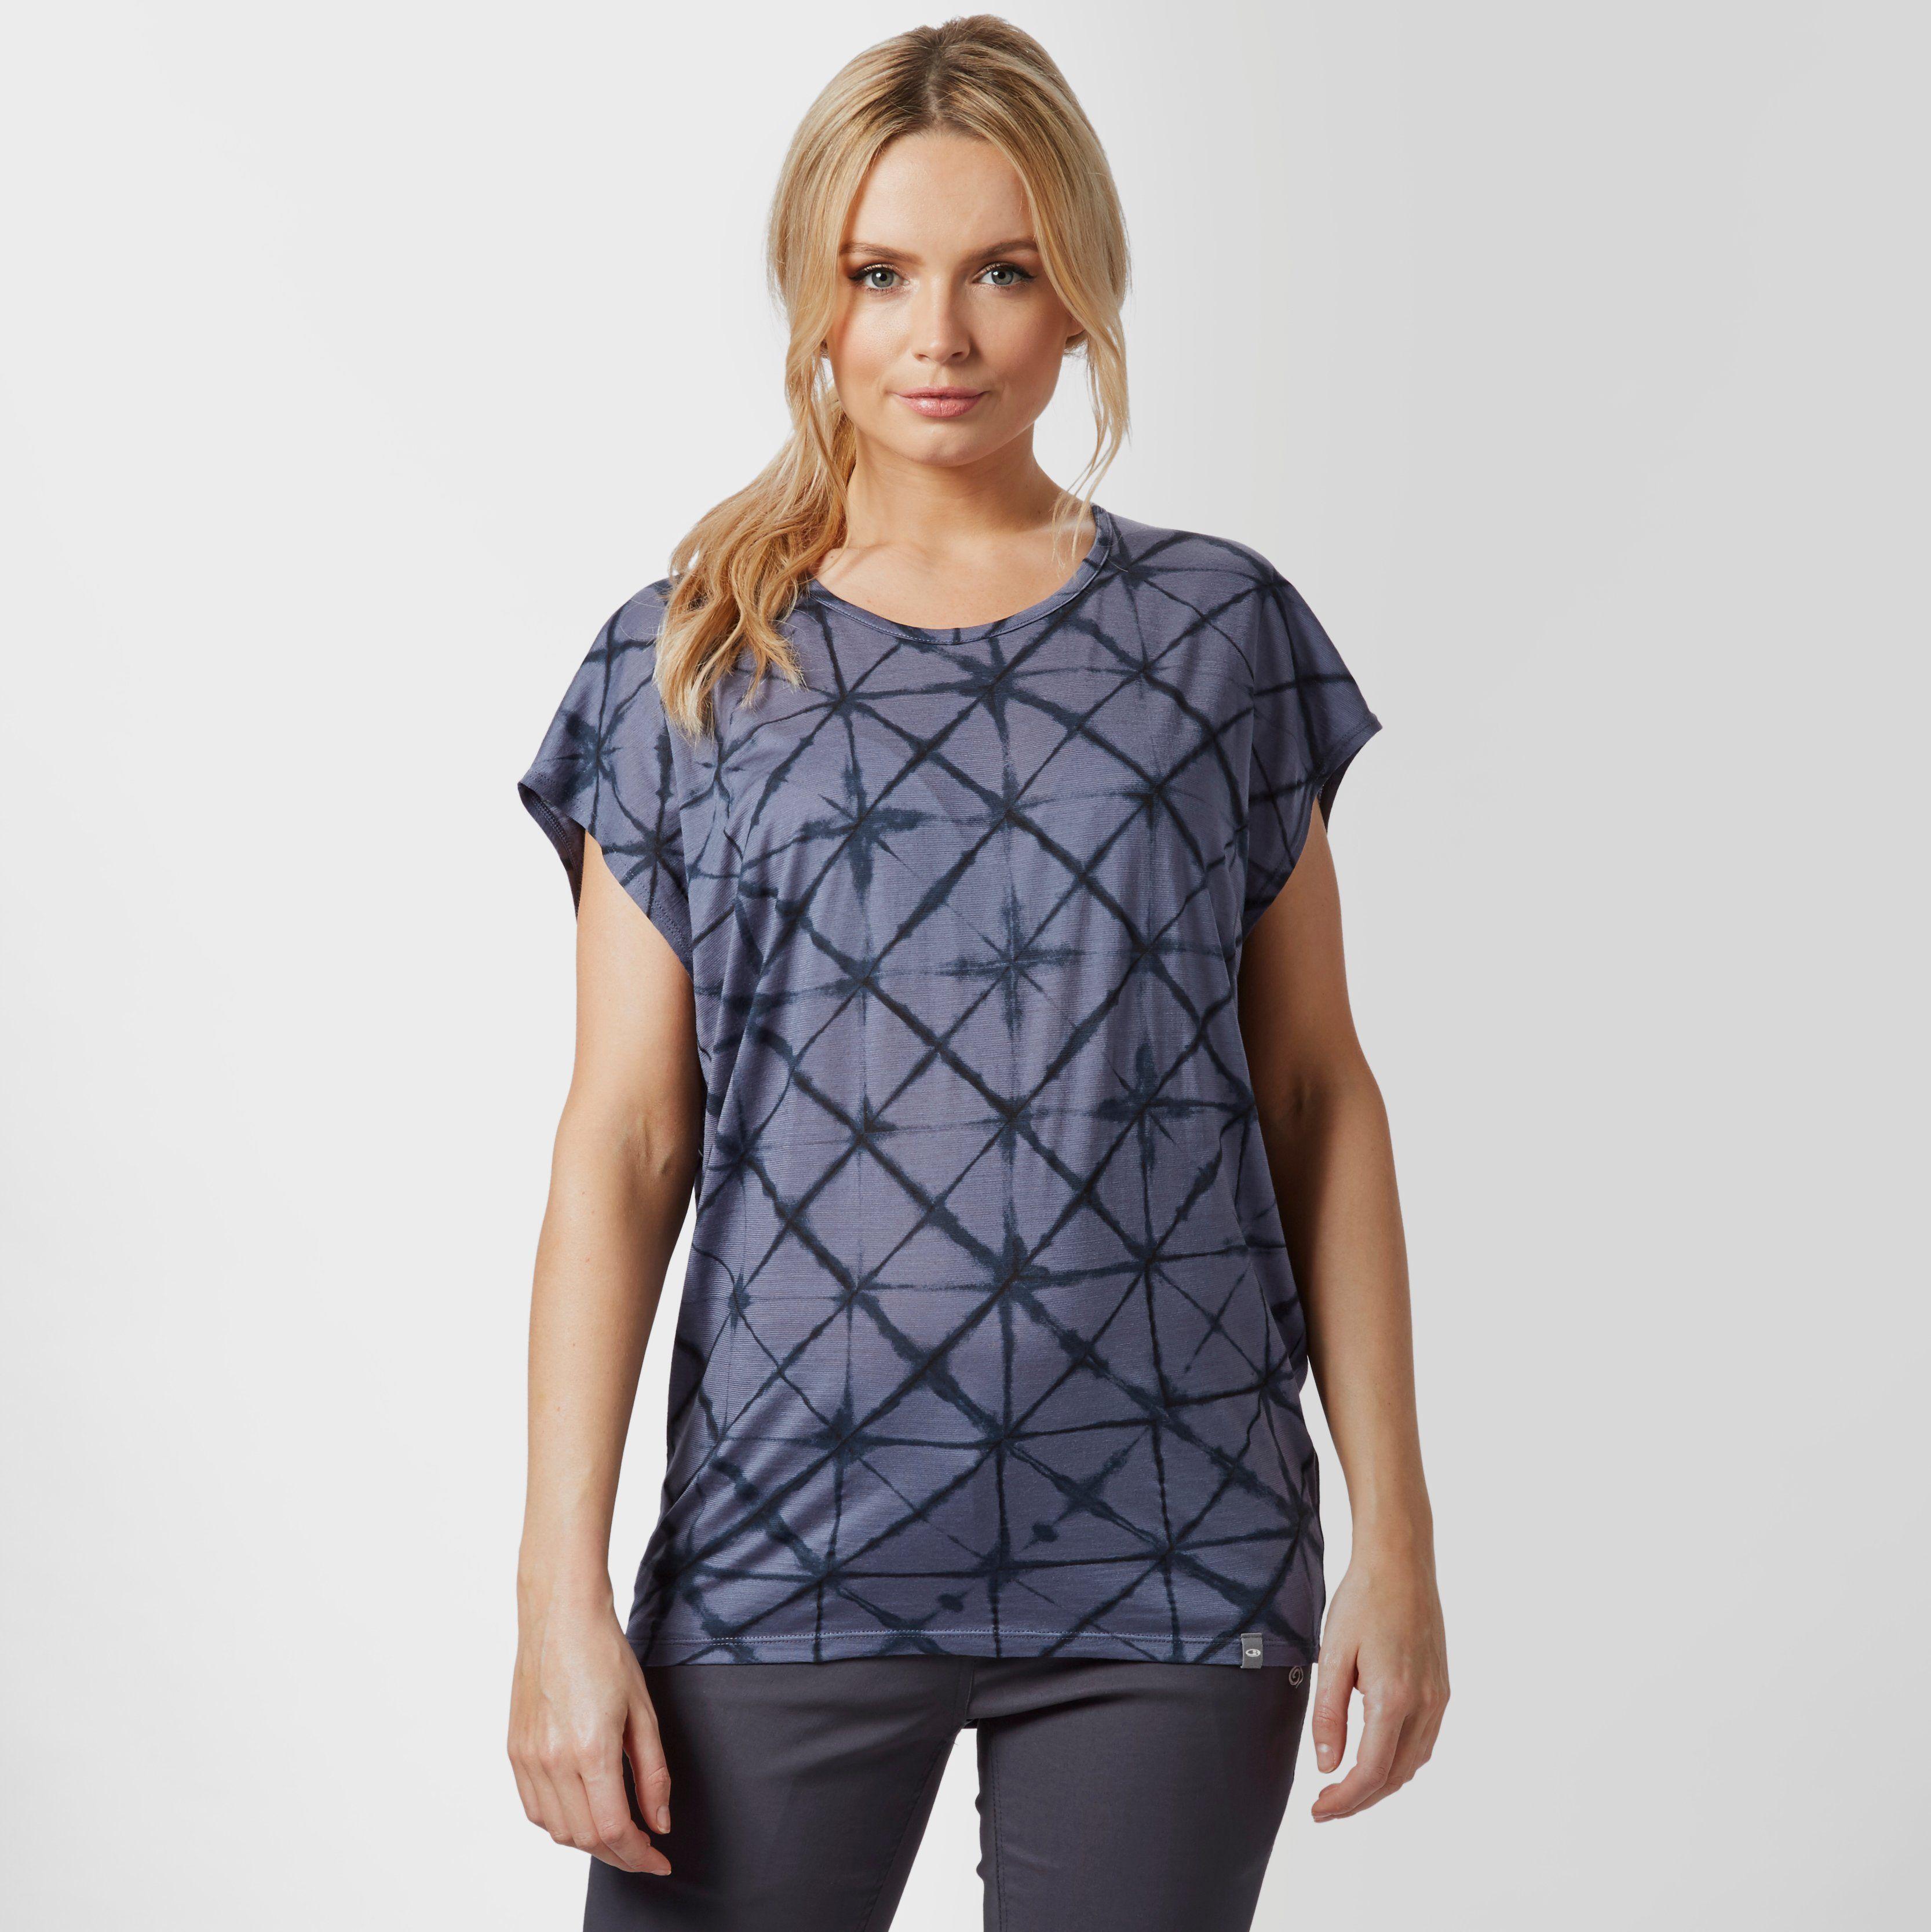 ICEBREAKER Women's Nomi Short Sleeve T-Shirt